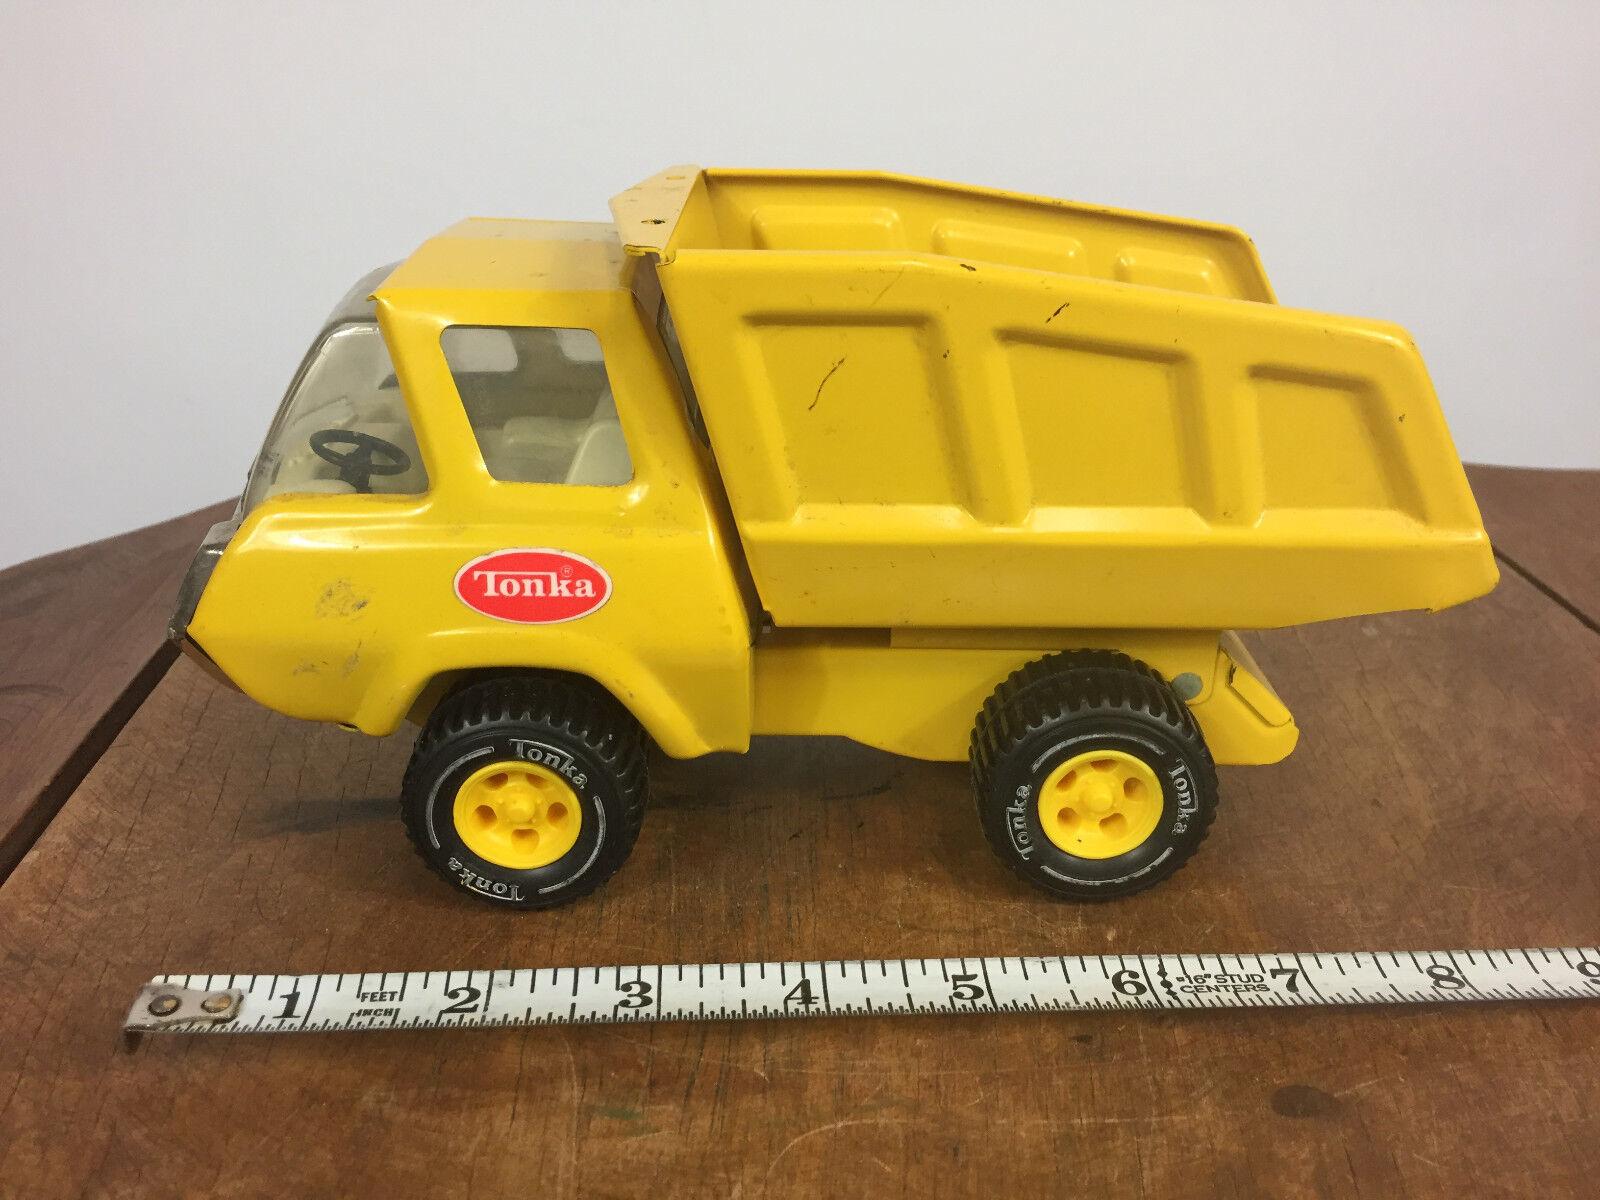 Vintage Jaune Métal TONKA camion benne Mid Century Toy travail voiture 60 s 70 s